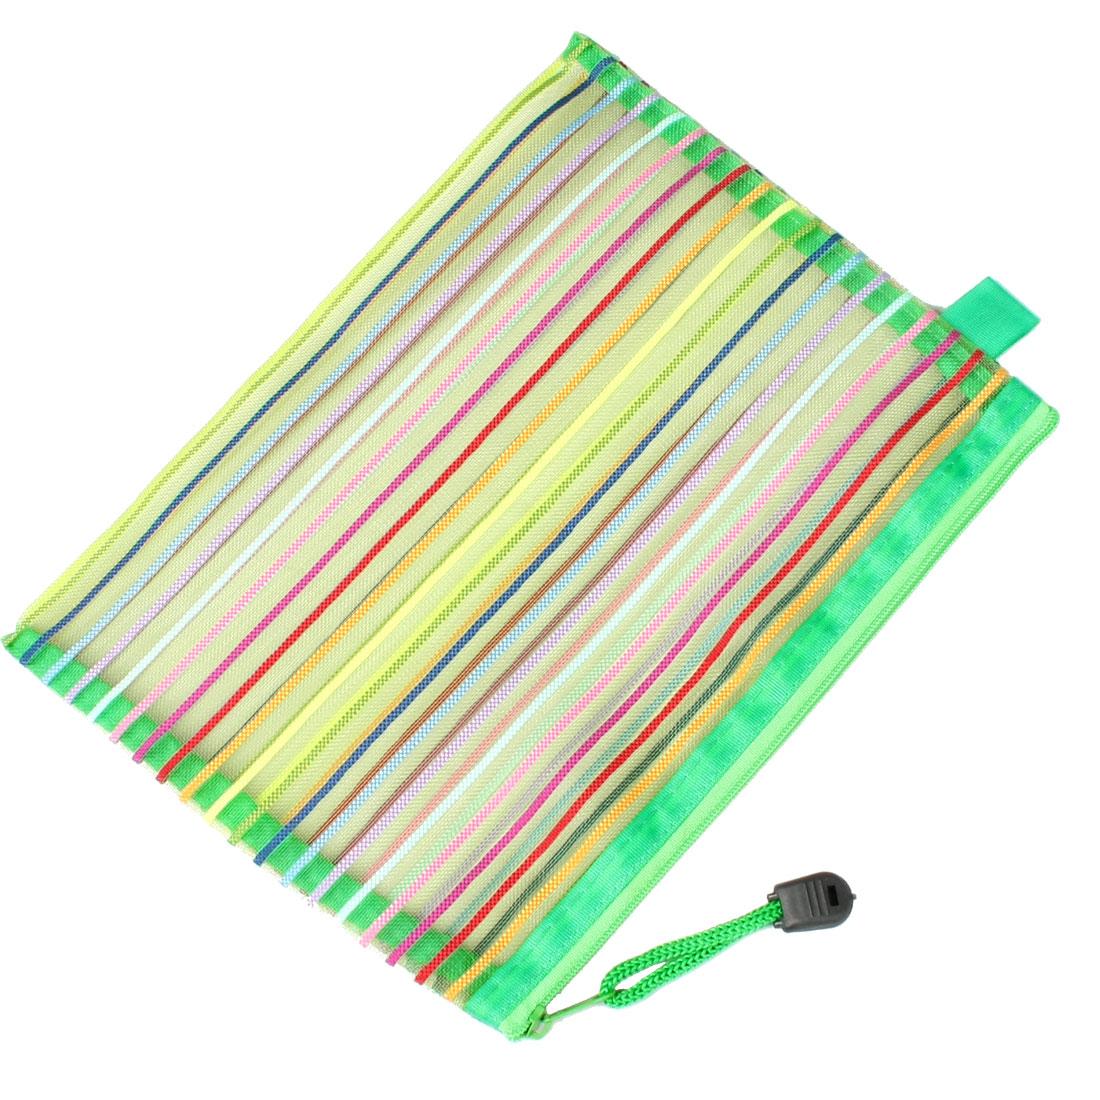 Stripe Pattern Gridding Bag A5 Paper File Folder Organizer Green w Strap